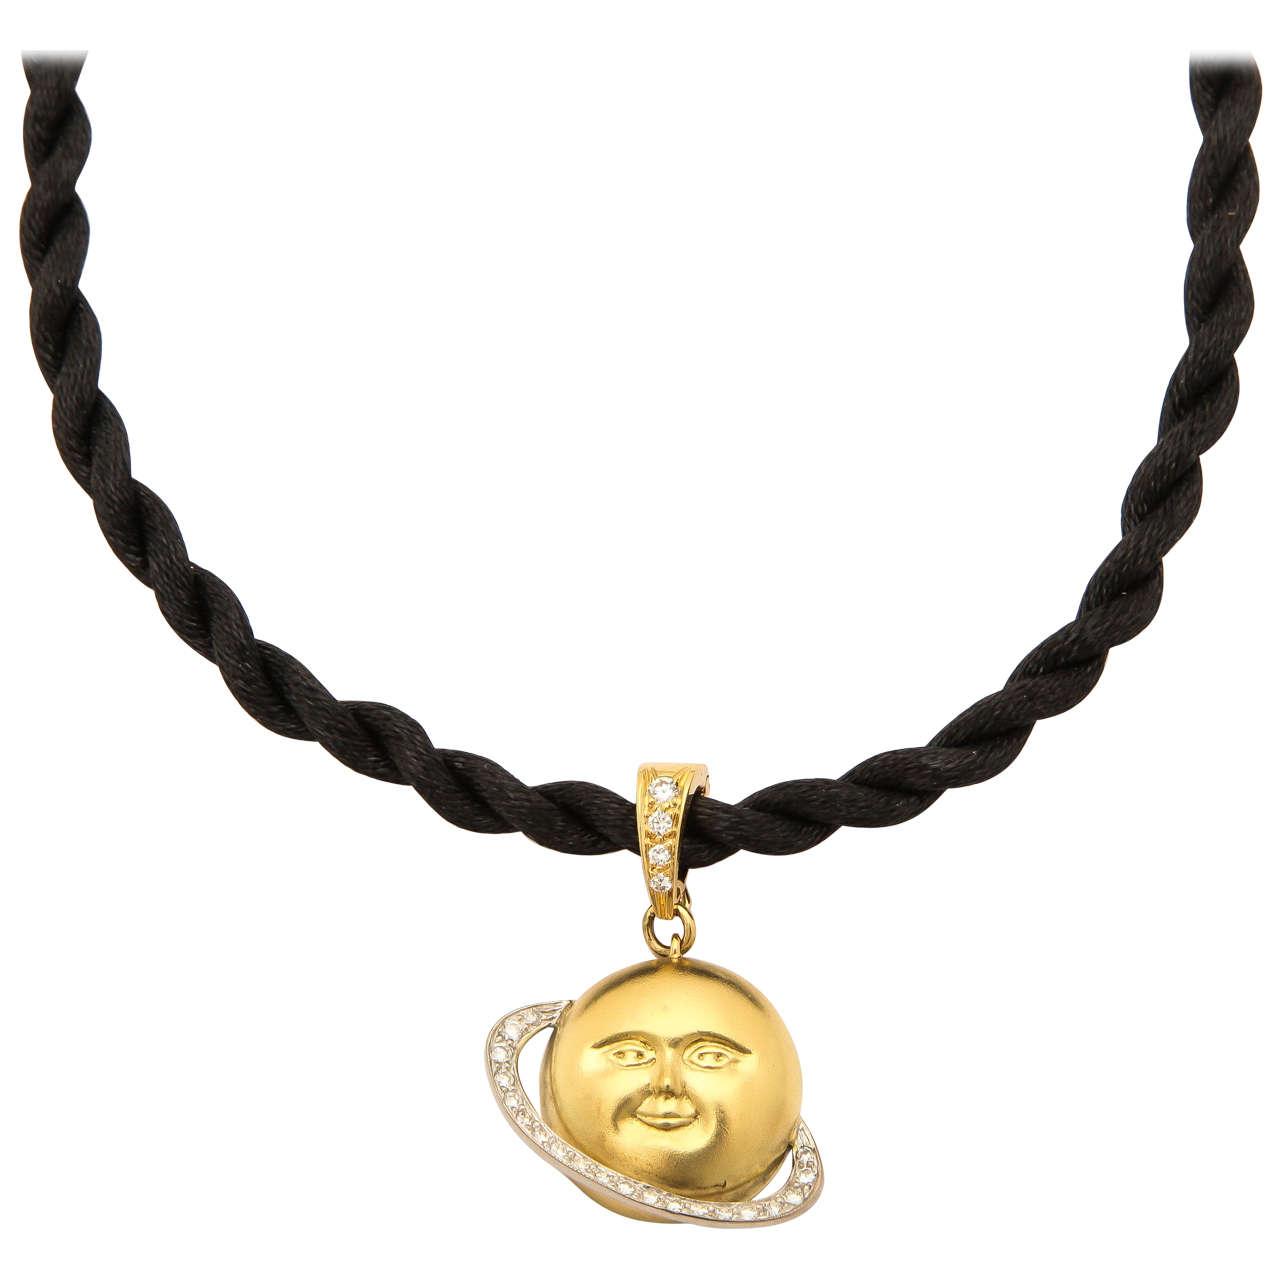 Gold and Platinum Saturn Celestial Pendant Necklace